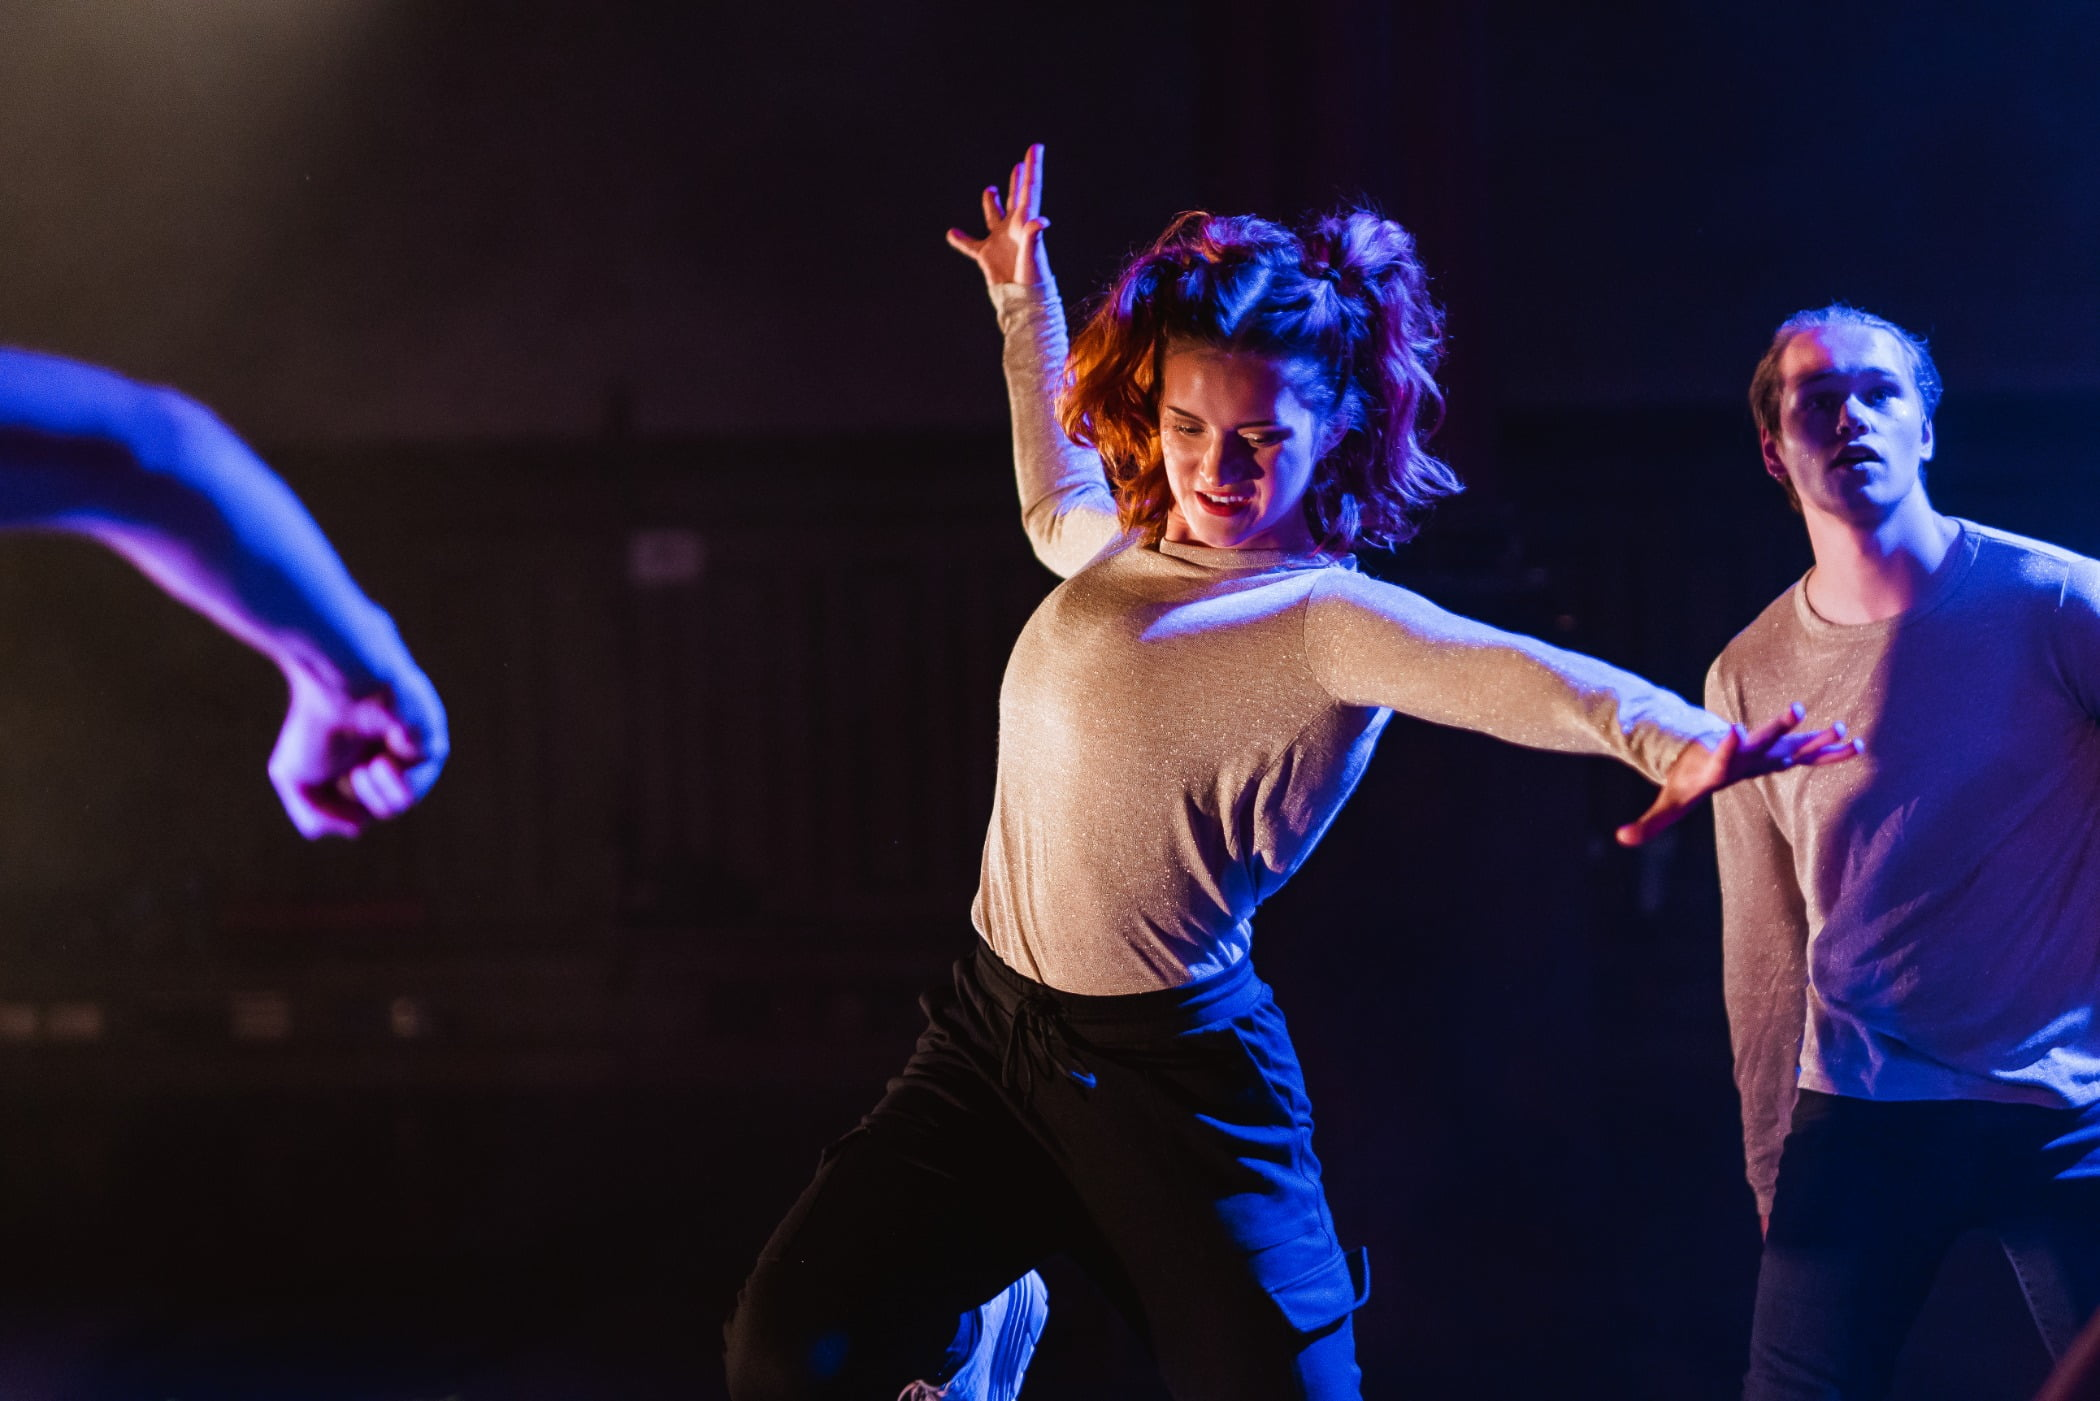 Performance art, Electric blue, Performing arts, Dance, Choreography, Dancer, Artist, Entertainment, Arm